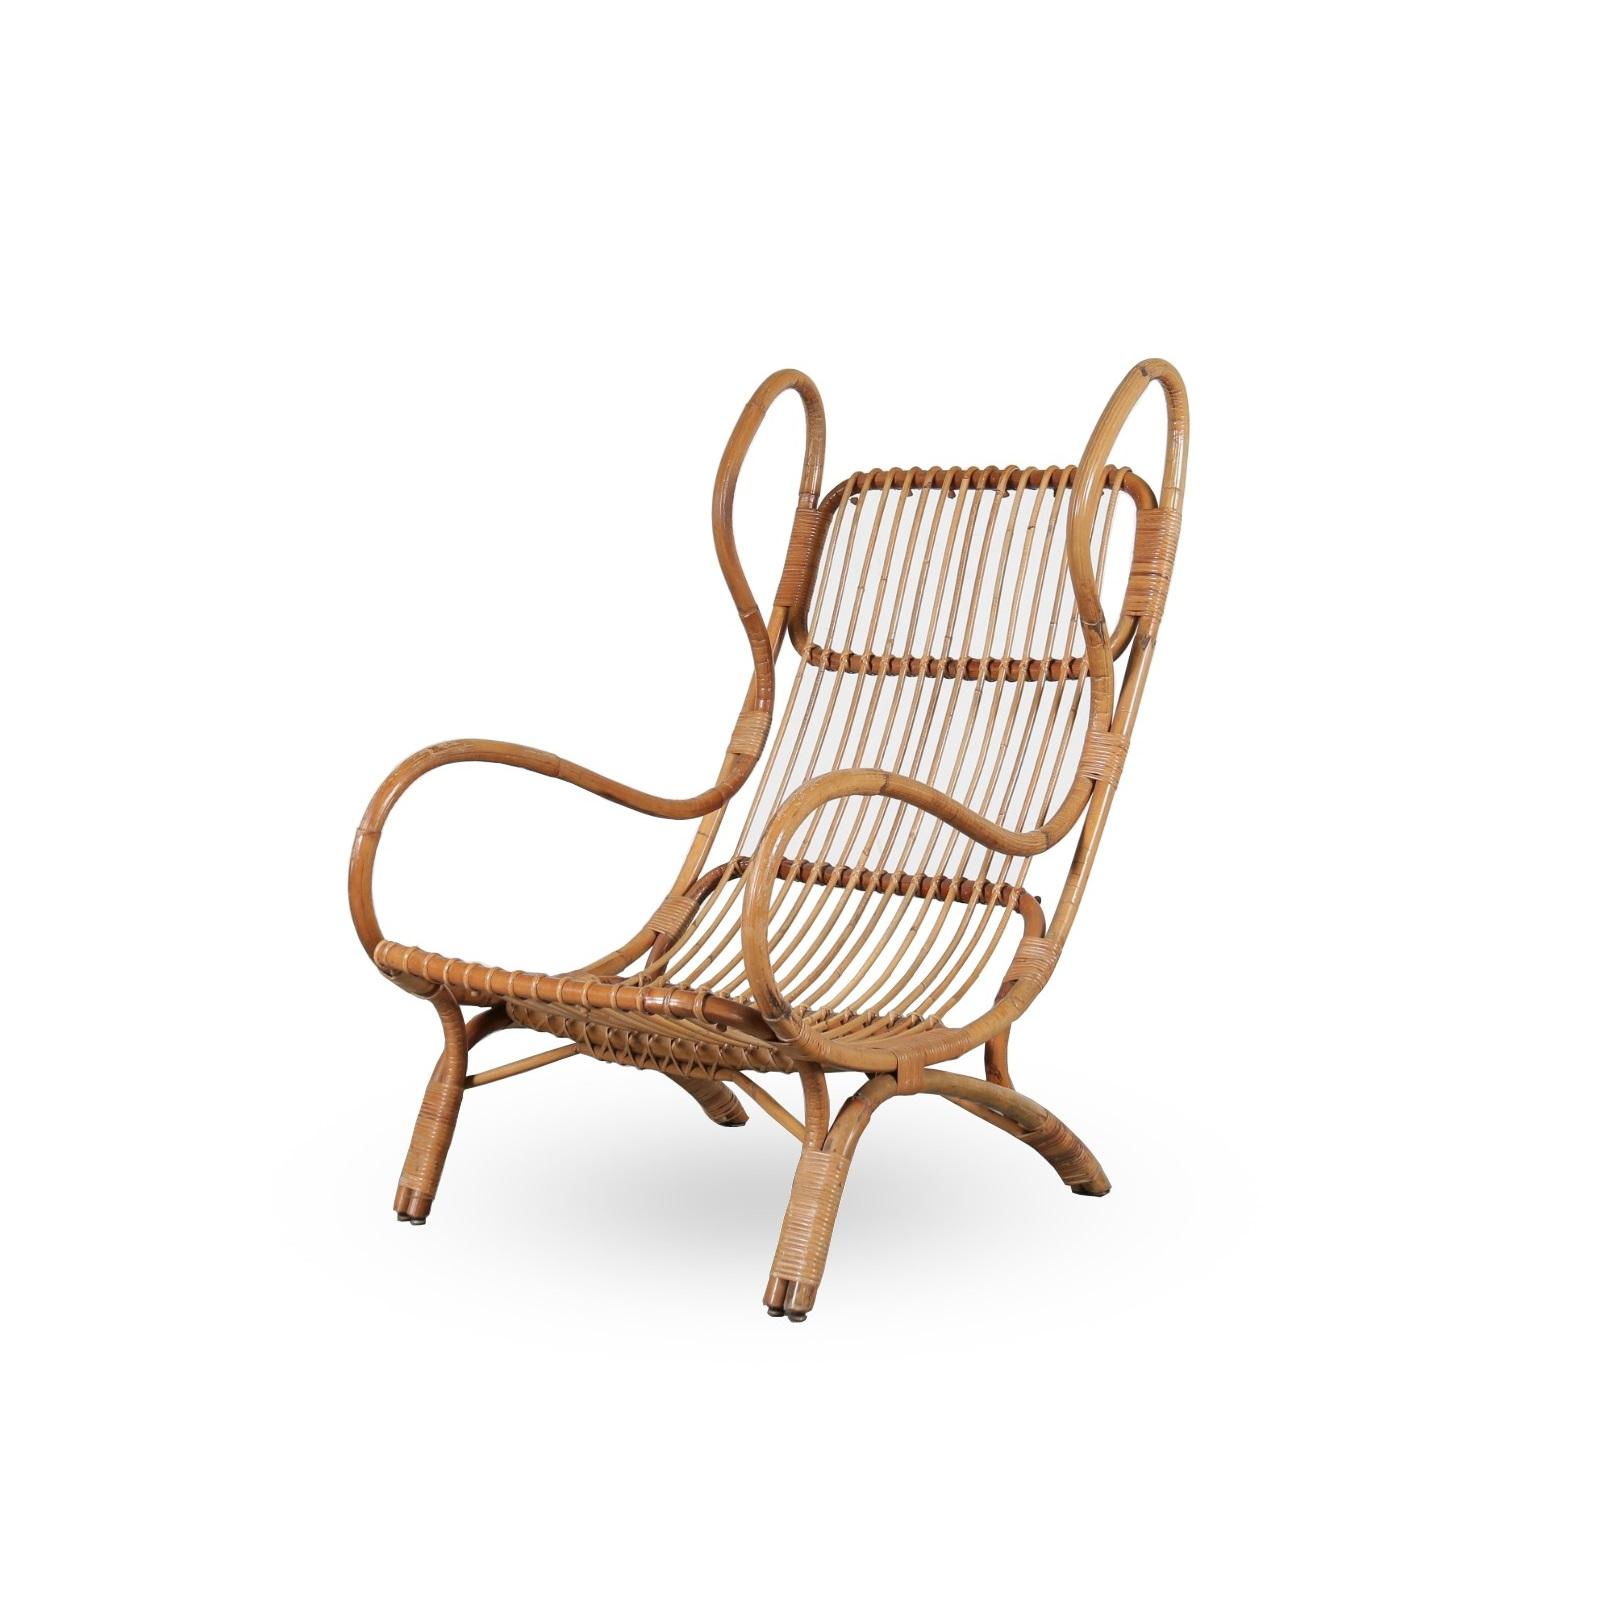 m23908 1950s Rattan easy chair Gio Ponti Bonacina / Italy